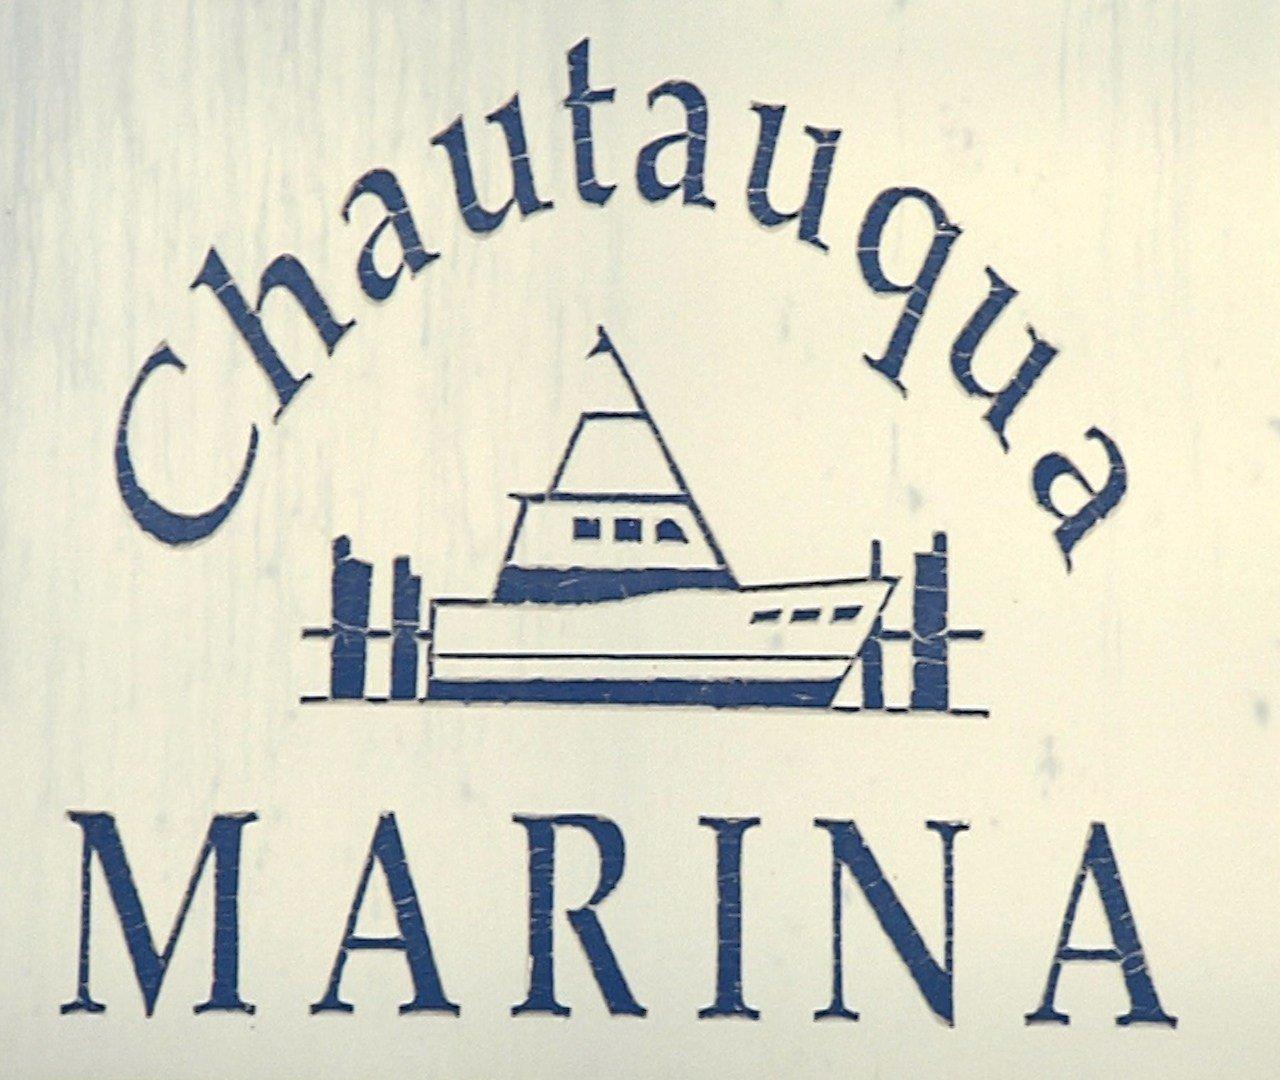 Chautauqua Marina